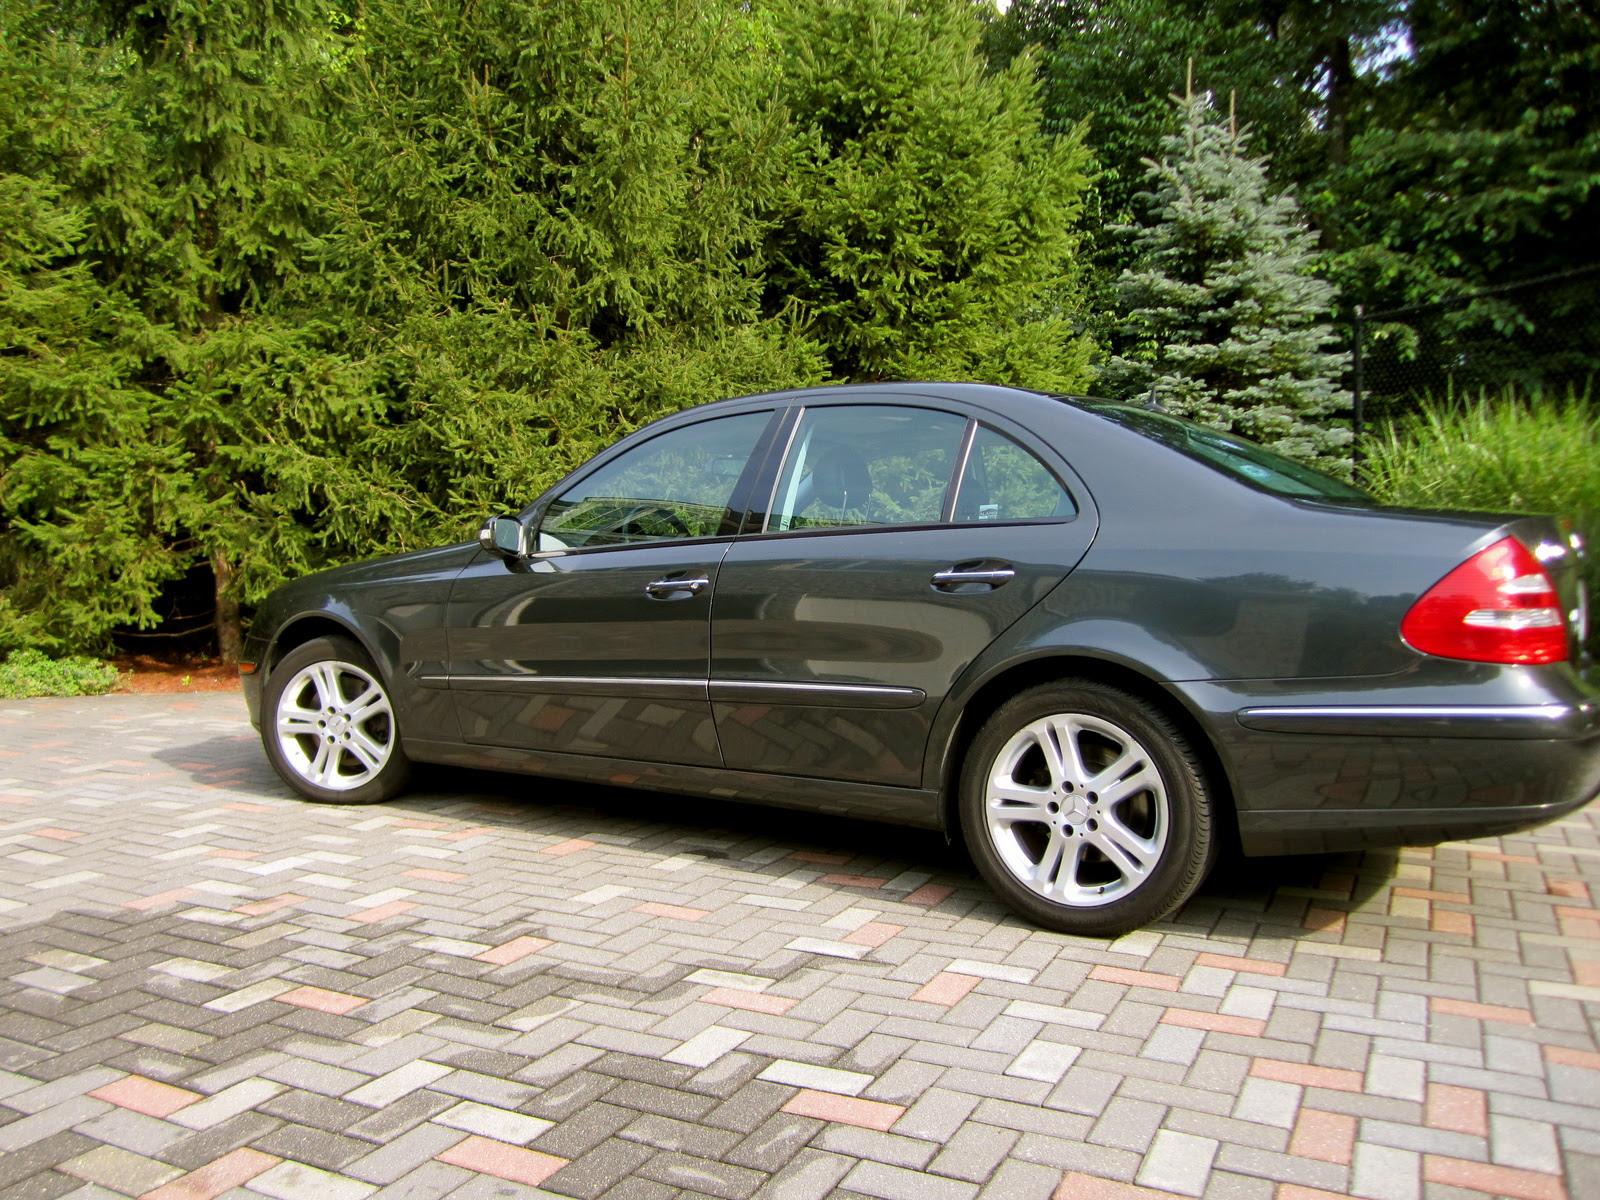 2004 Mercedes-Benz E-Class - Trim Information - CarGurus